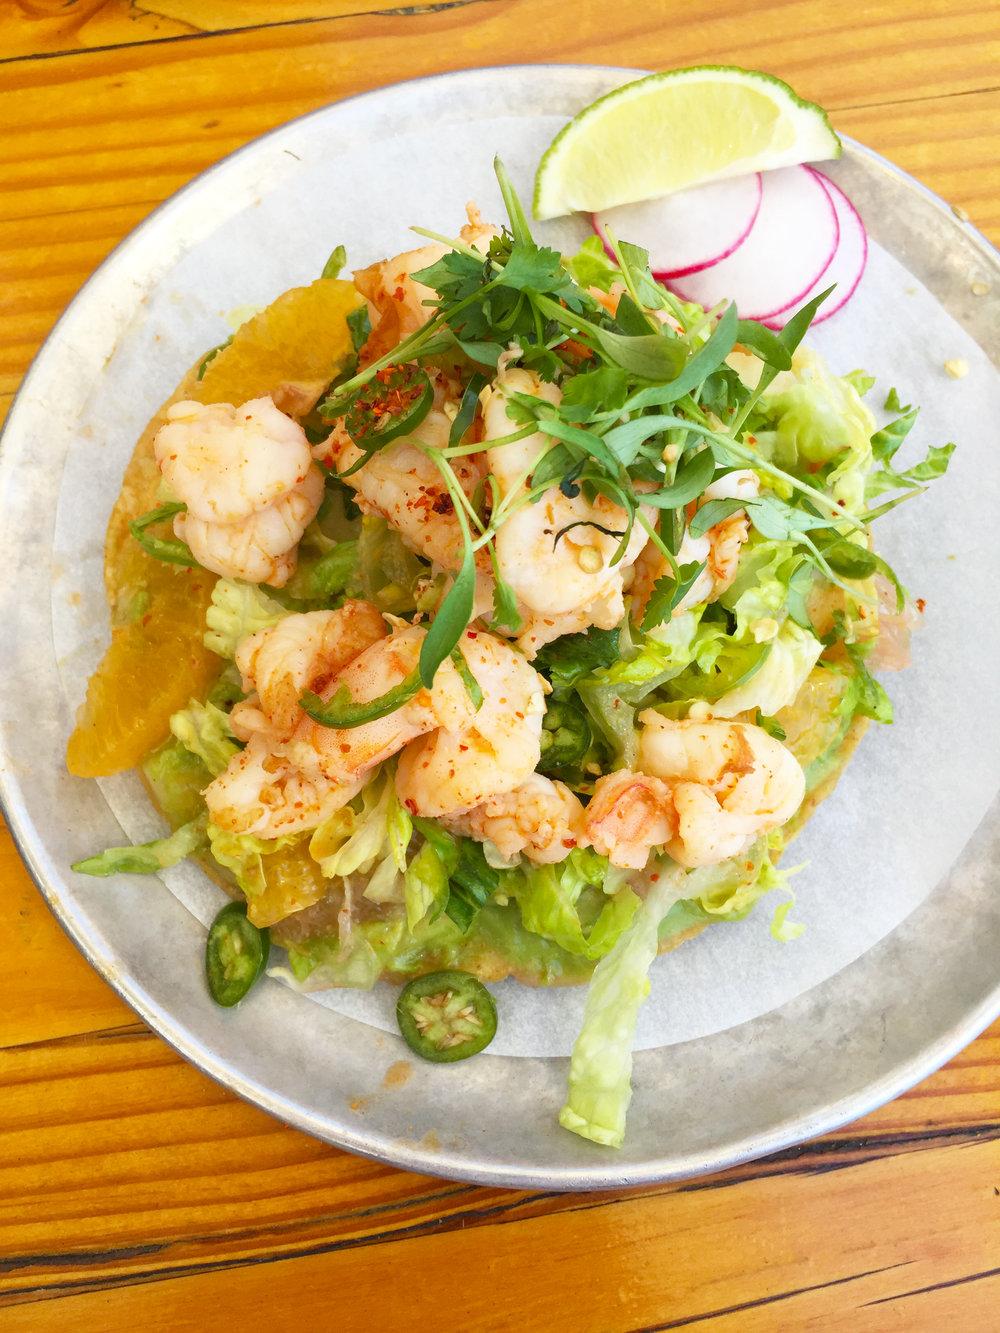 SHRIMP TOSTADA - citrus / lettuce / cherry tomato / hass avocado / serrano pepper.